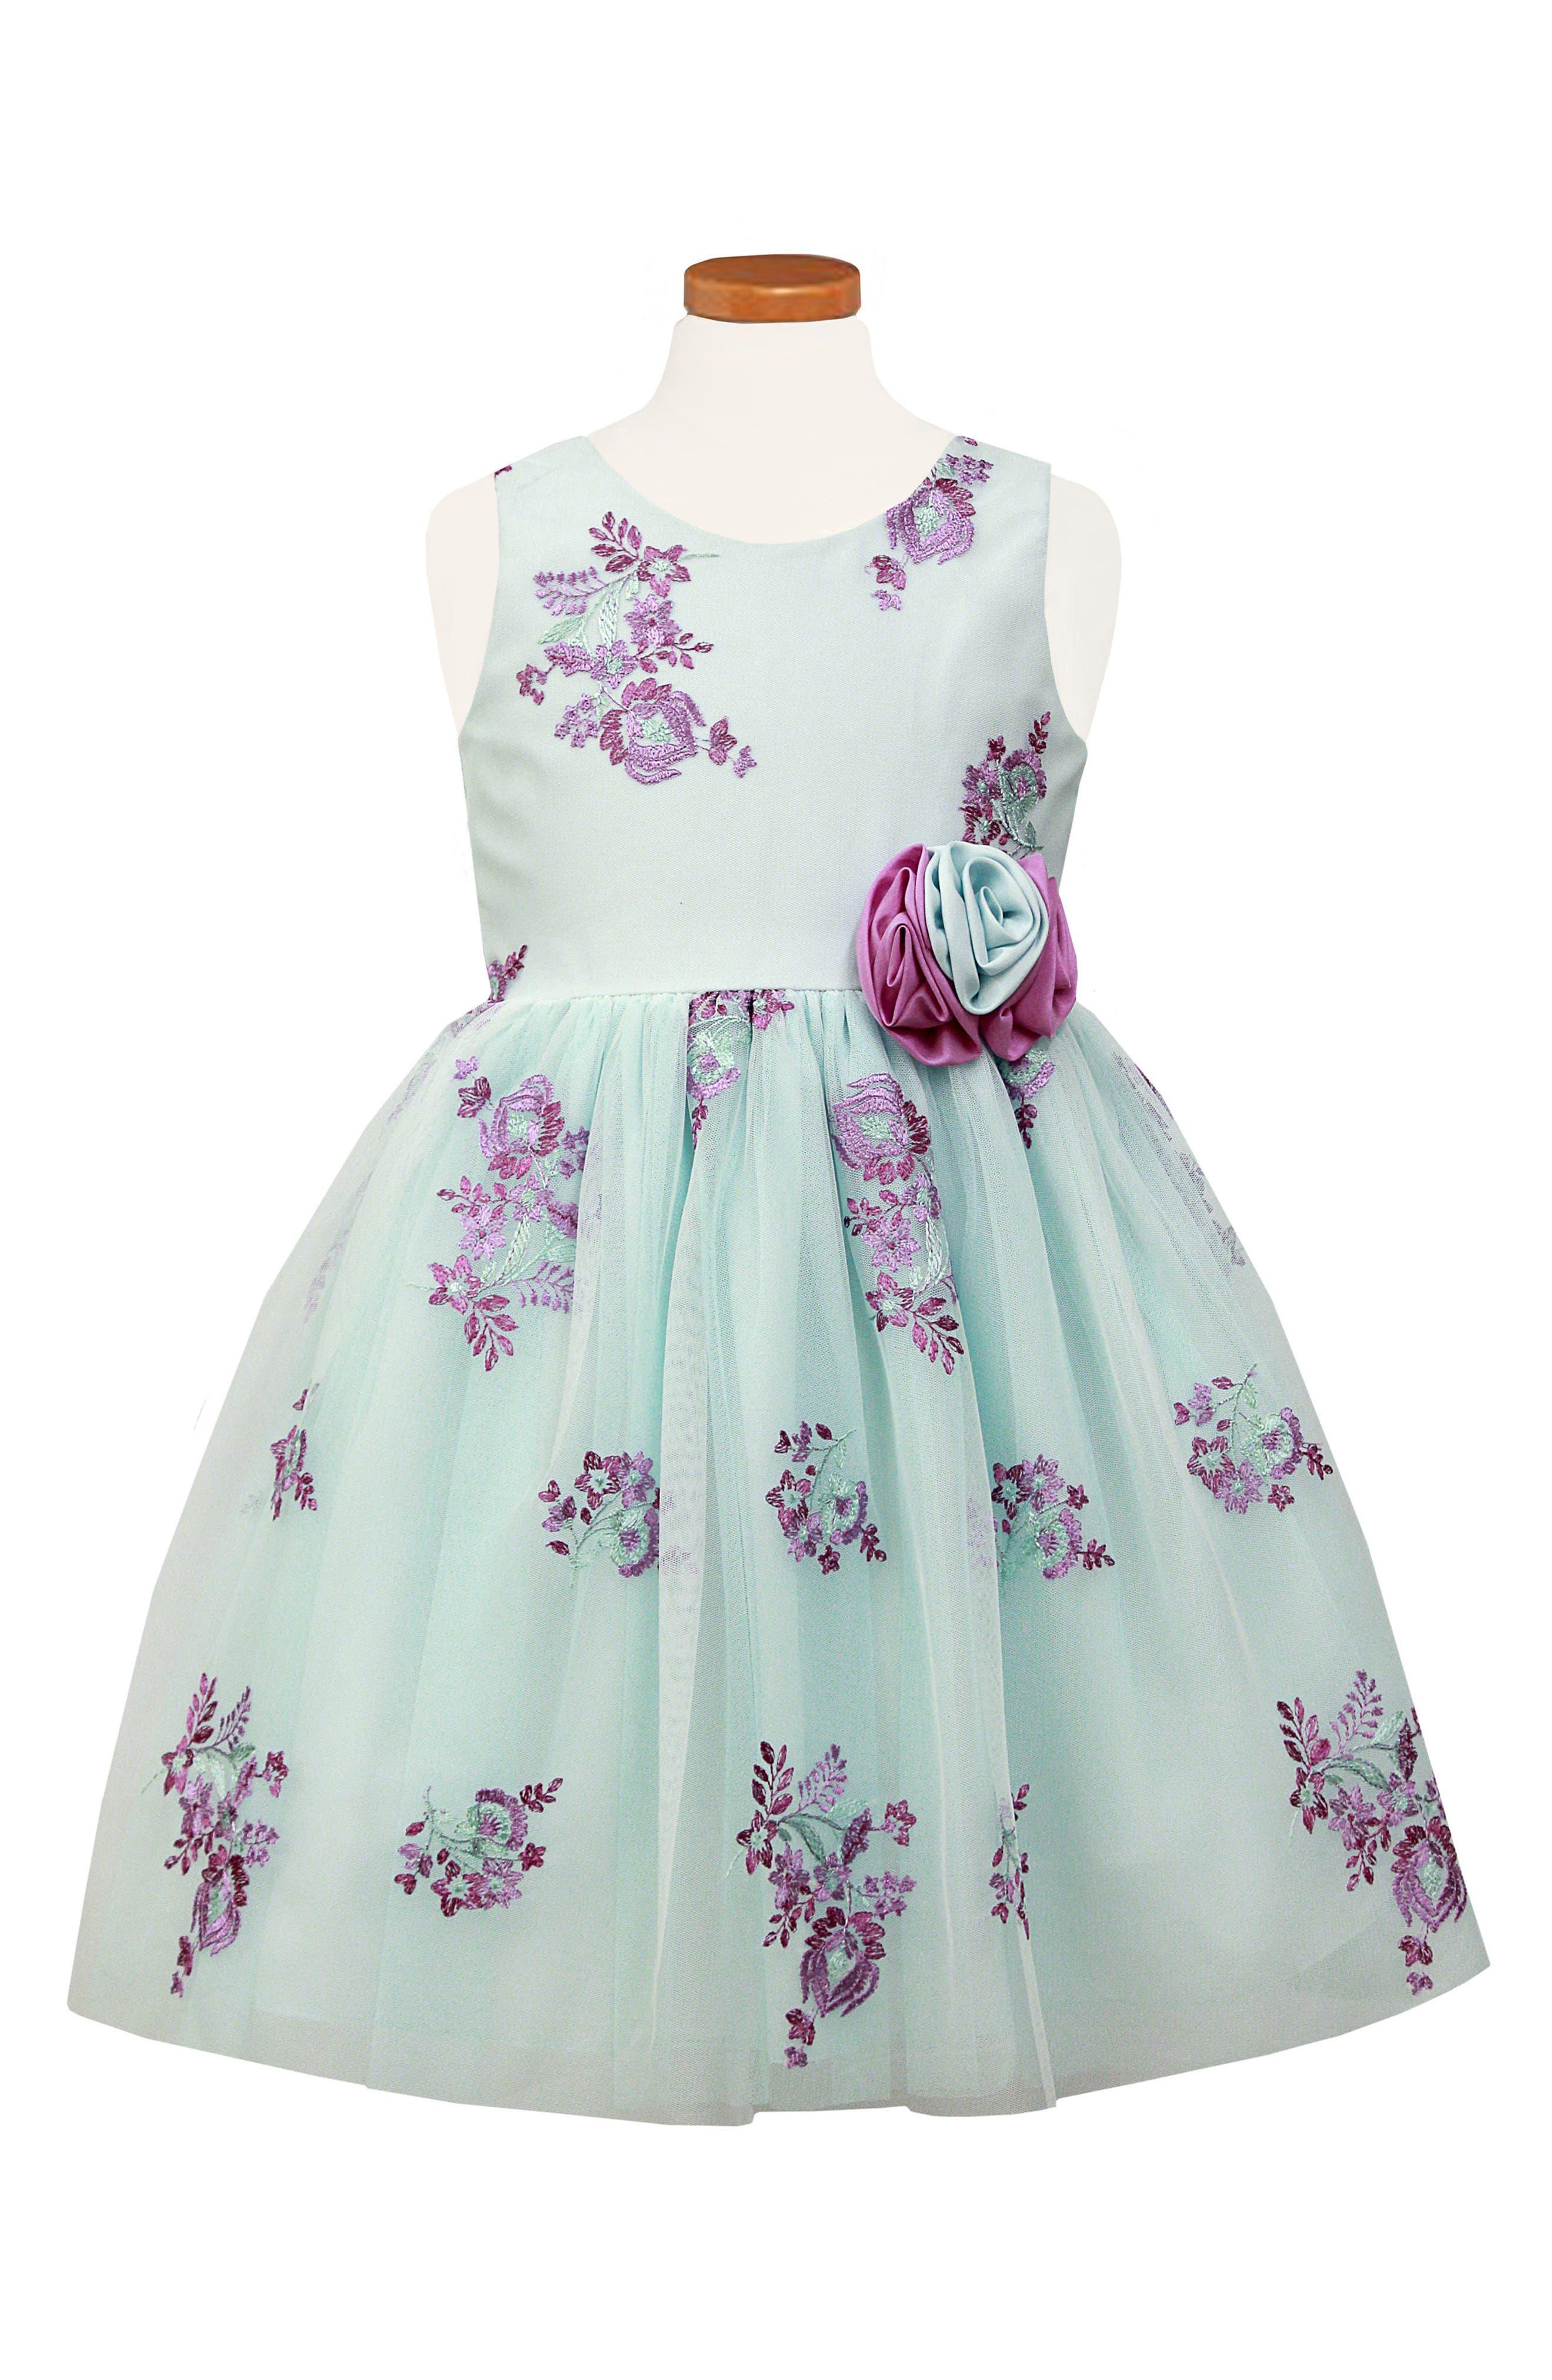 Sorbet Embroidered Floral Tulle Dress (Toddler Girls & Little Girls)